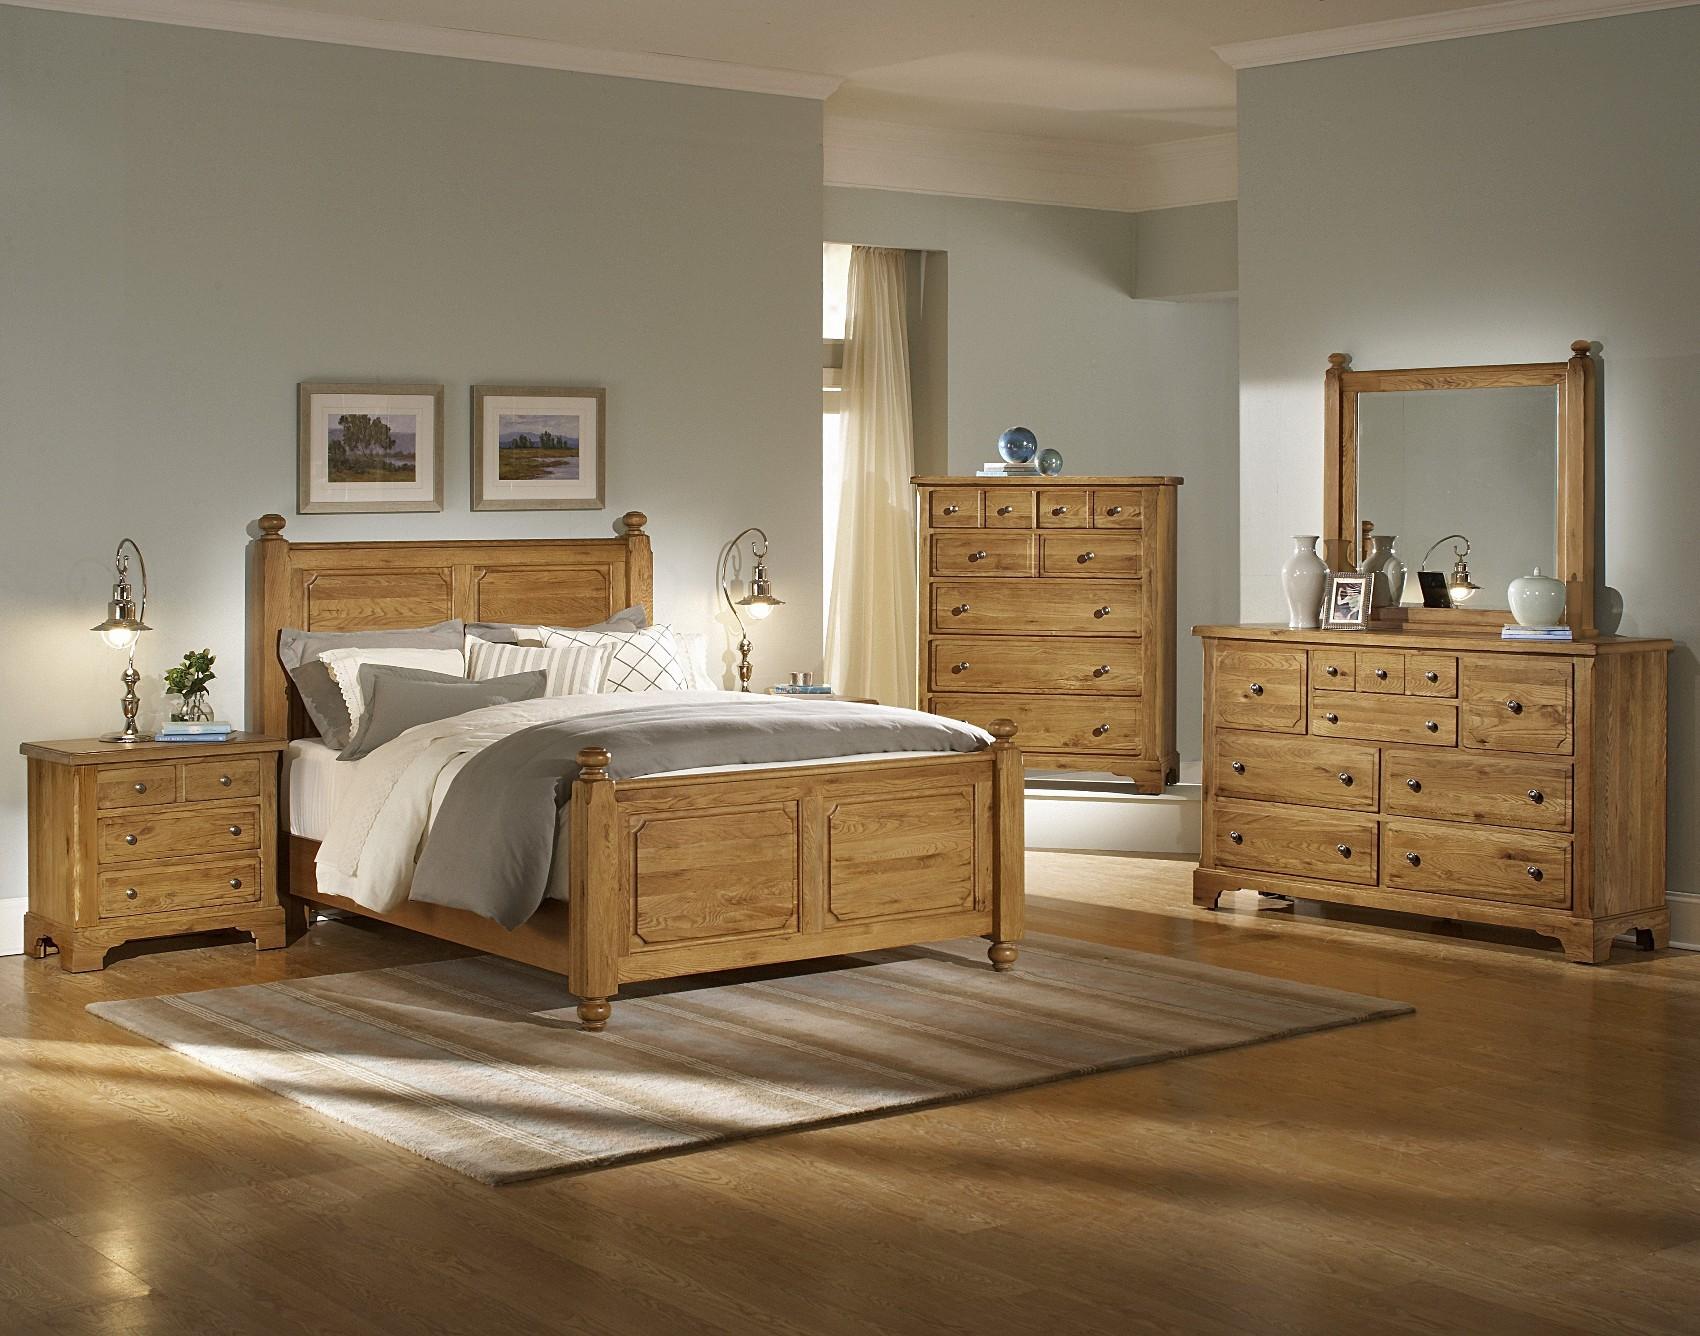 picture of bedroom decorating ideas with wood furniture design on vine rh designonvine com Rustic Bedroom Decorating Ideas with Wood Bedroom Decorating Ideas with Wood Wall